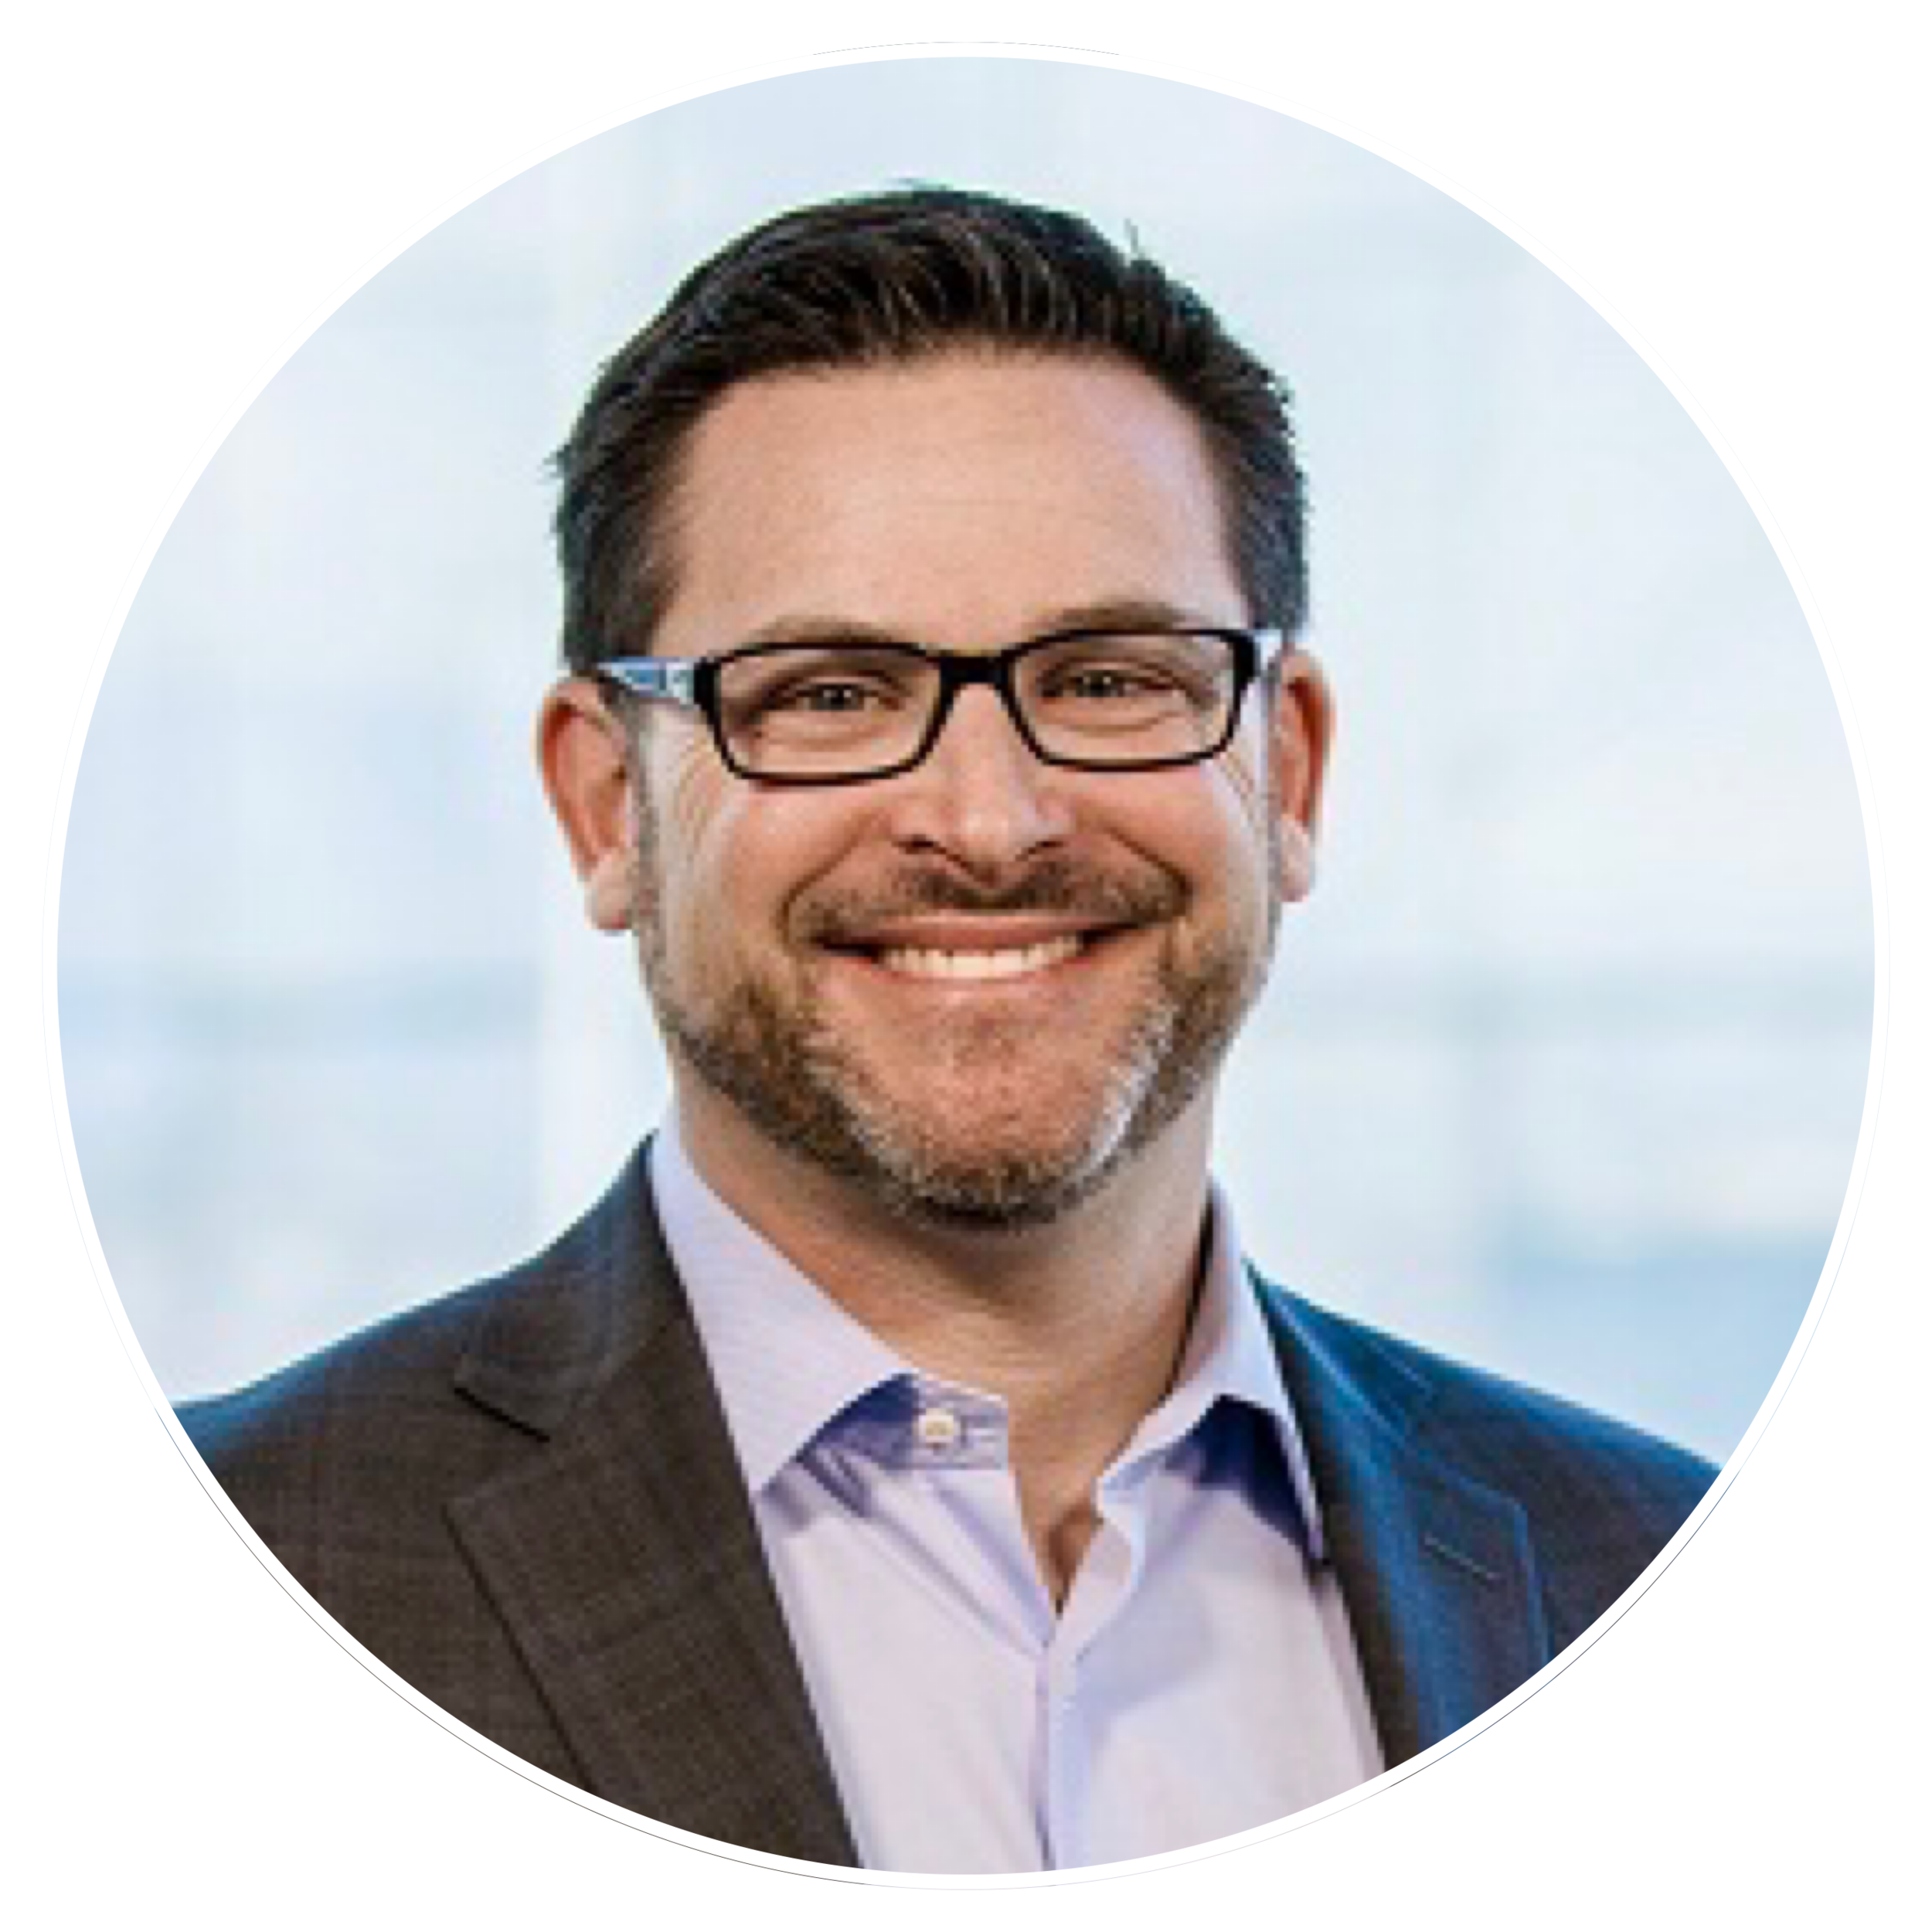 Hank Schlissberg - President, DaVita Health Solutions